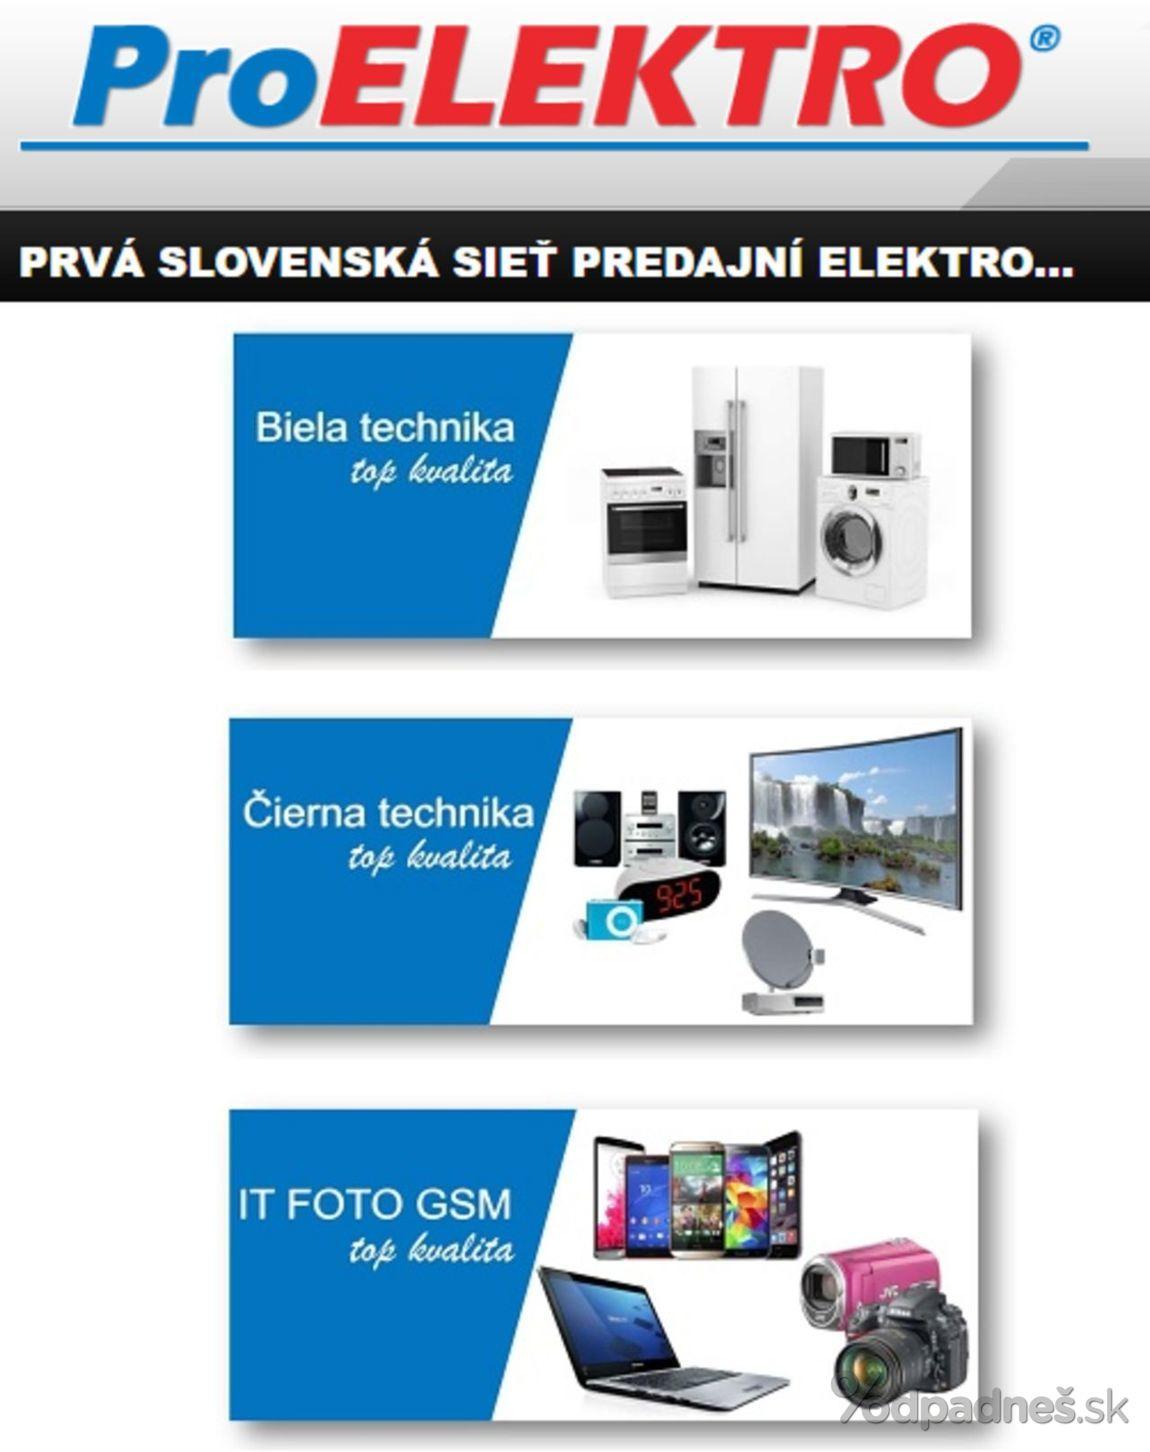 195c5ea32ca04 Pro Elektro leták platný do 30.9.2018 | Letákovo.sk